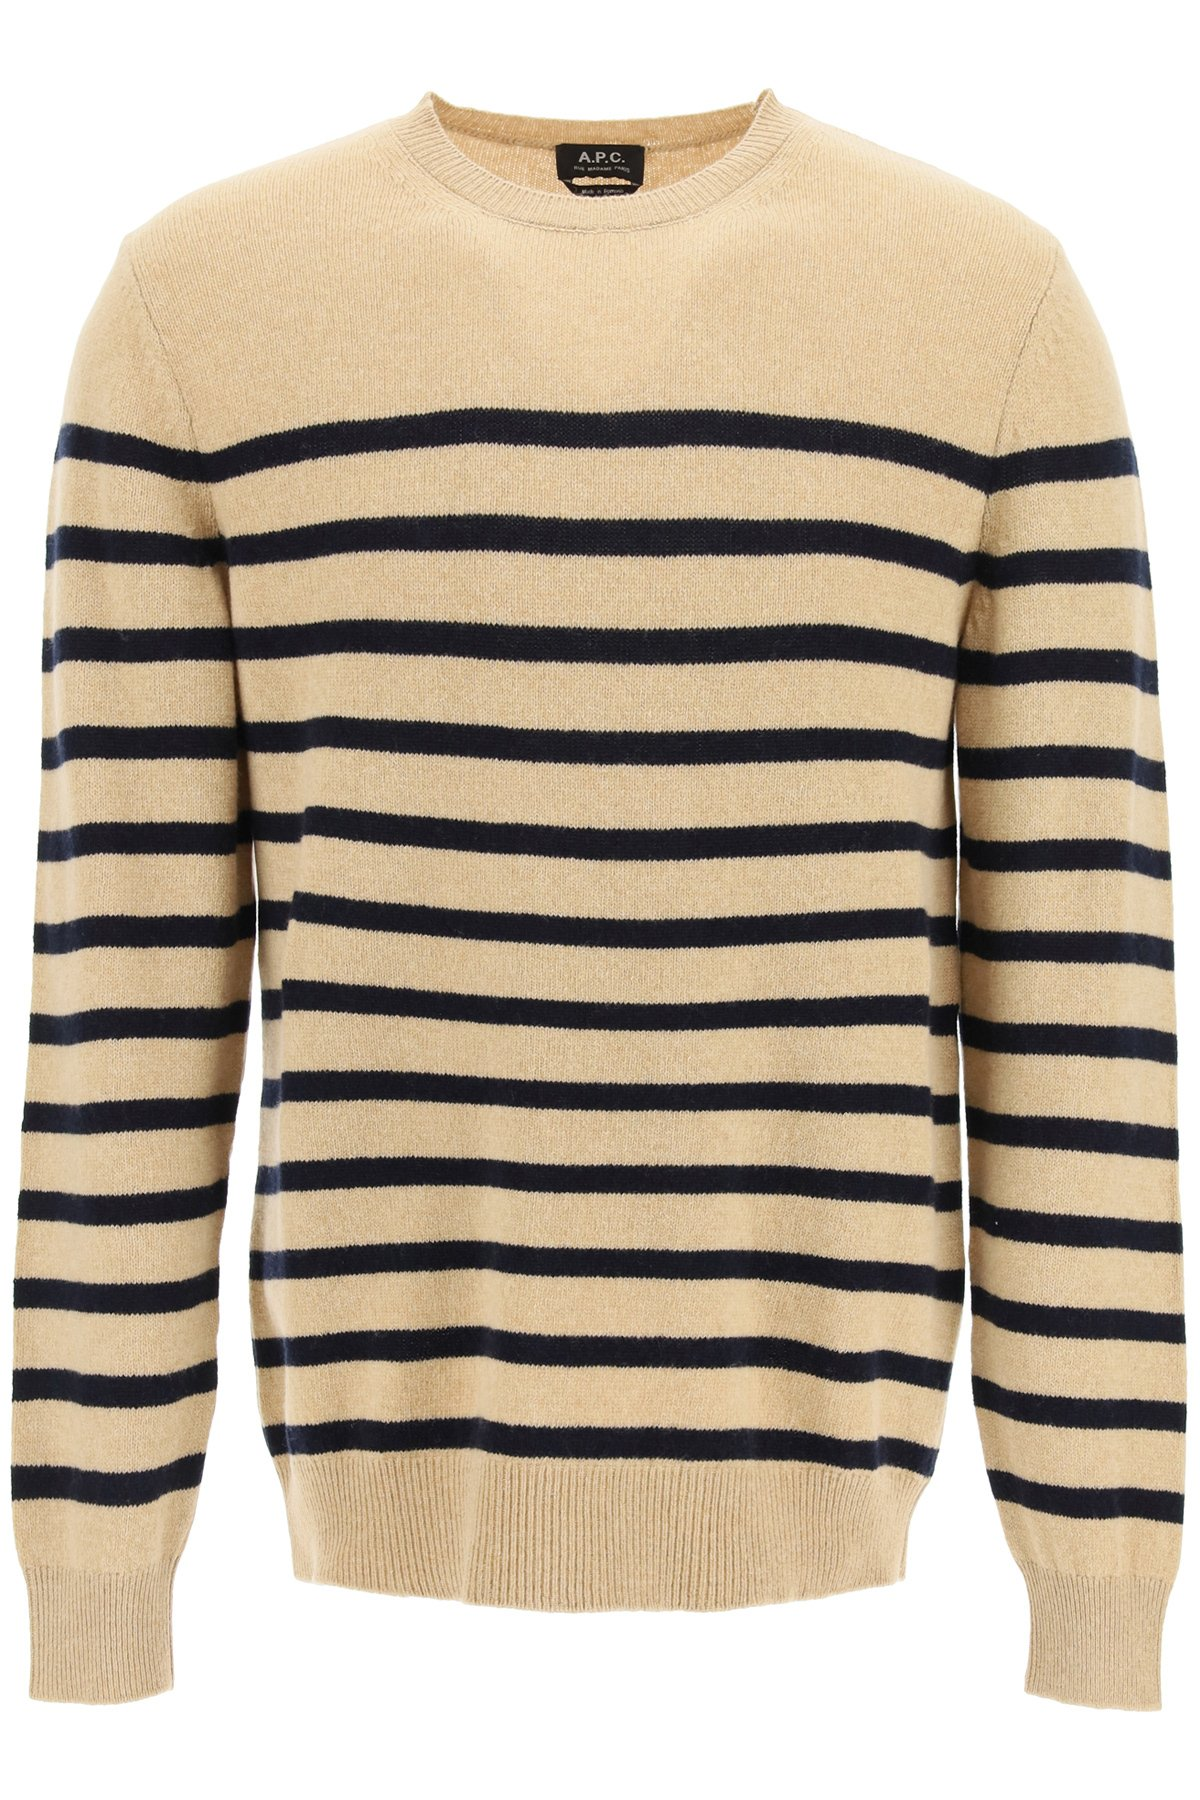 A.p.c. pullover travis a righe